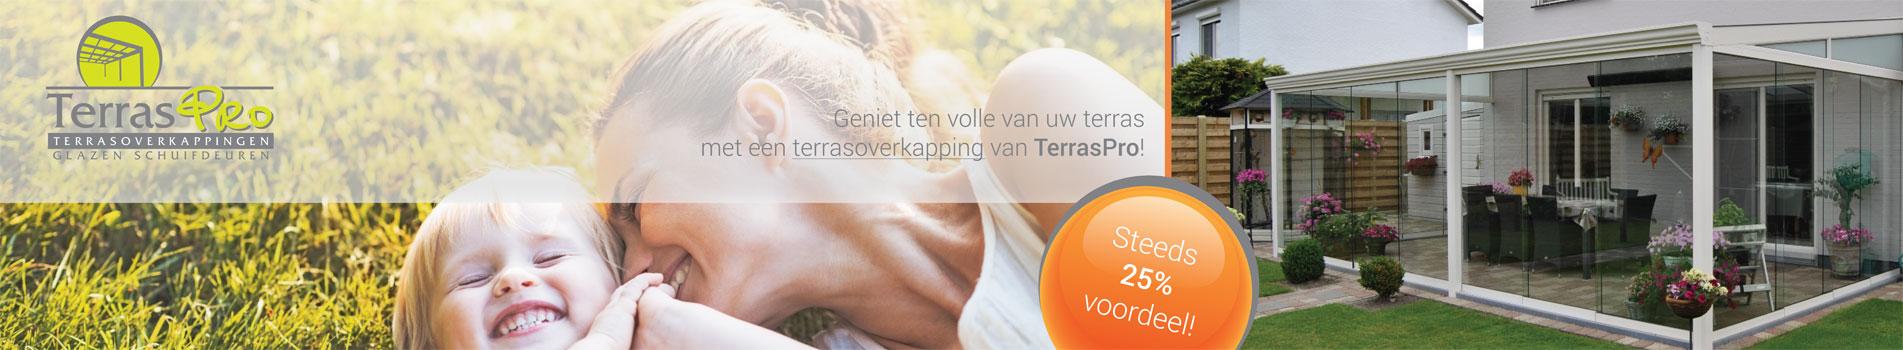 Terrasoverkapping-Terraspro-2